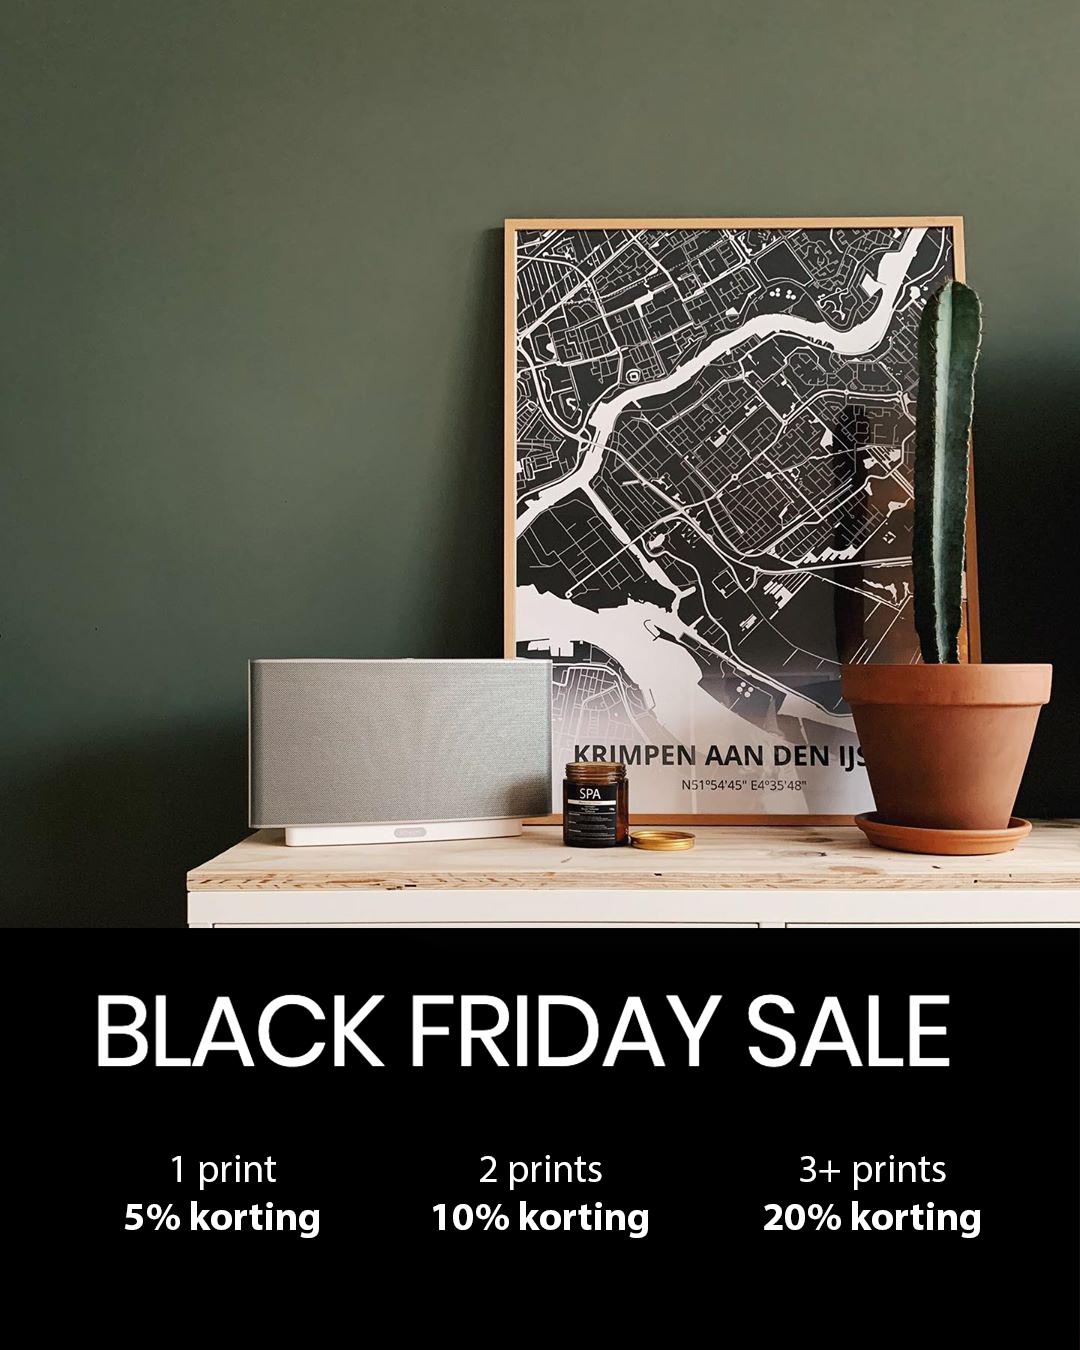 Tot 20% Black Friday Korting Op Design Posters @ Printmijnstad